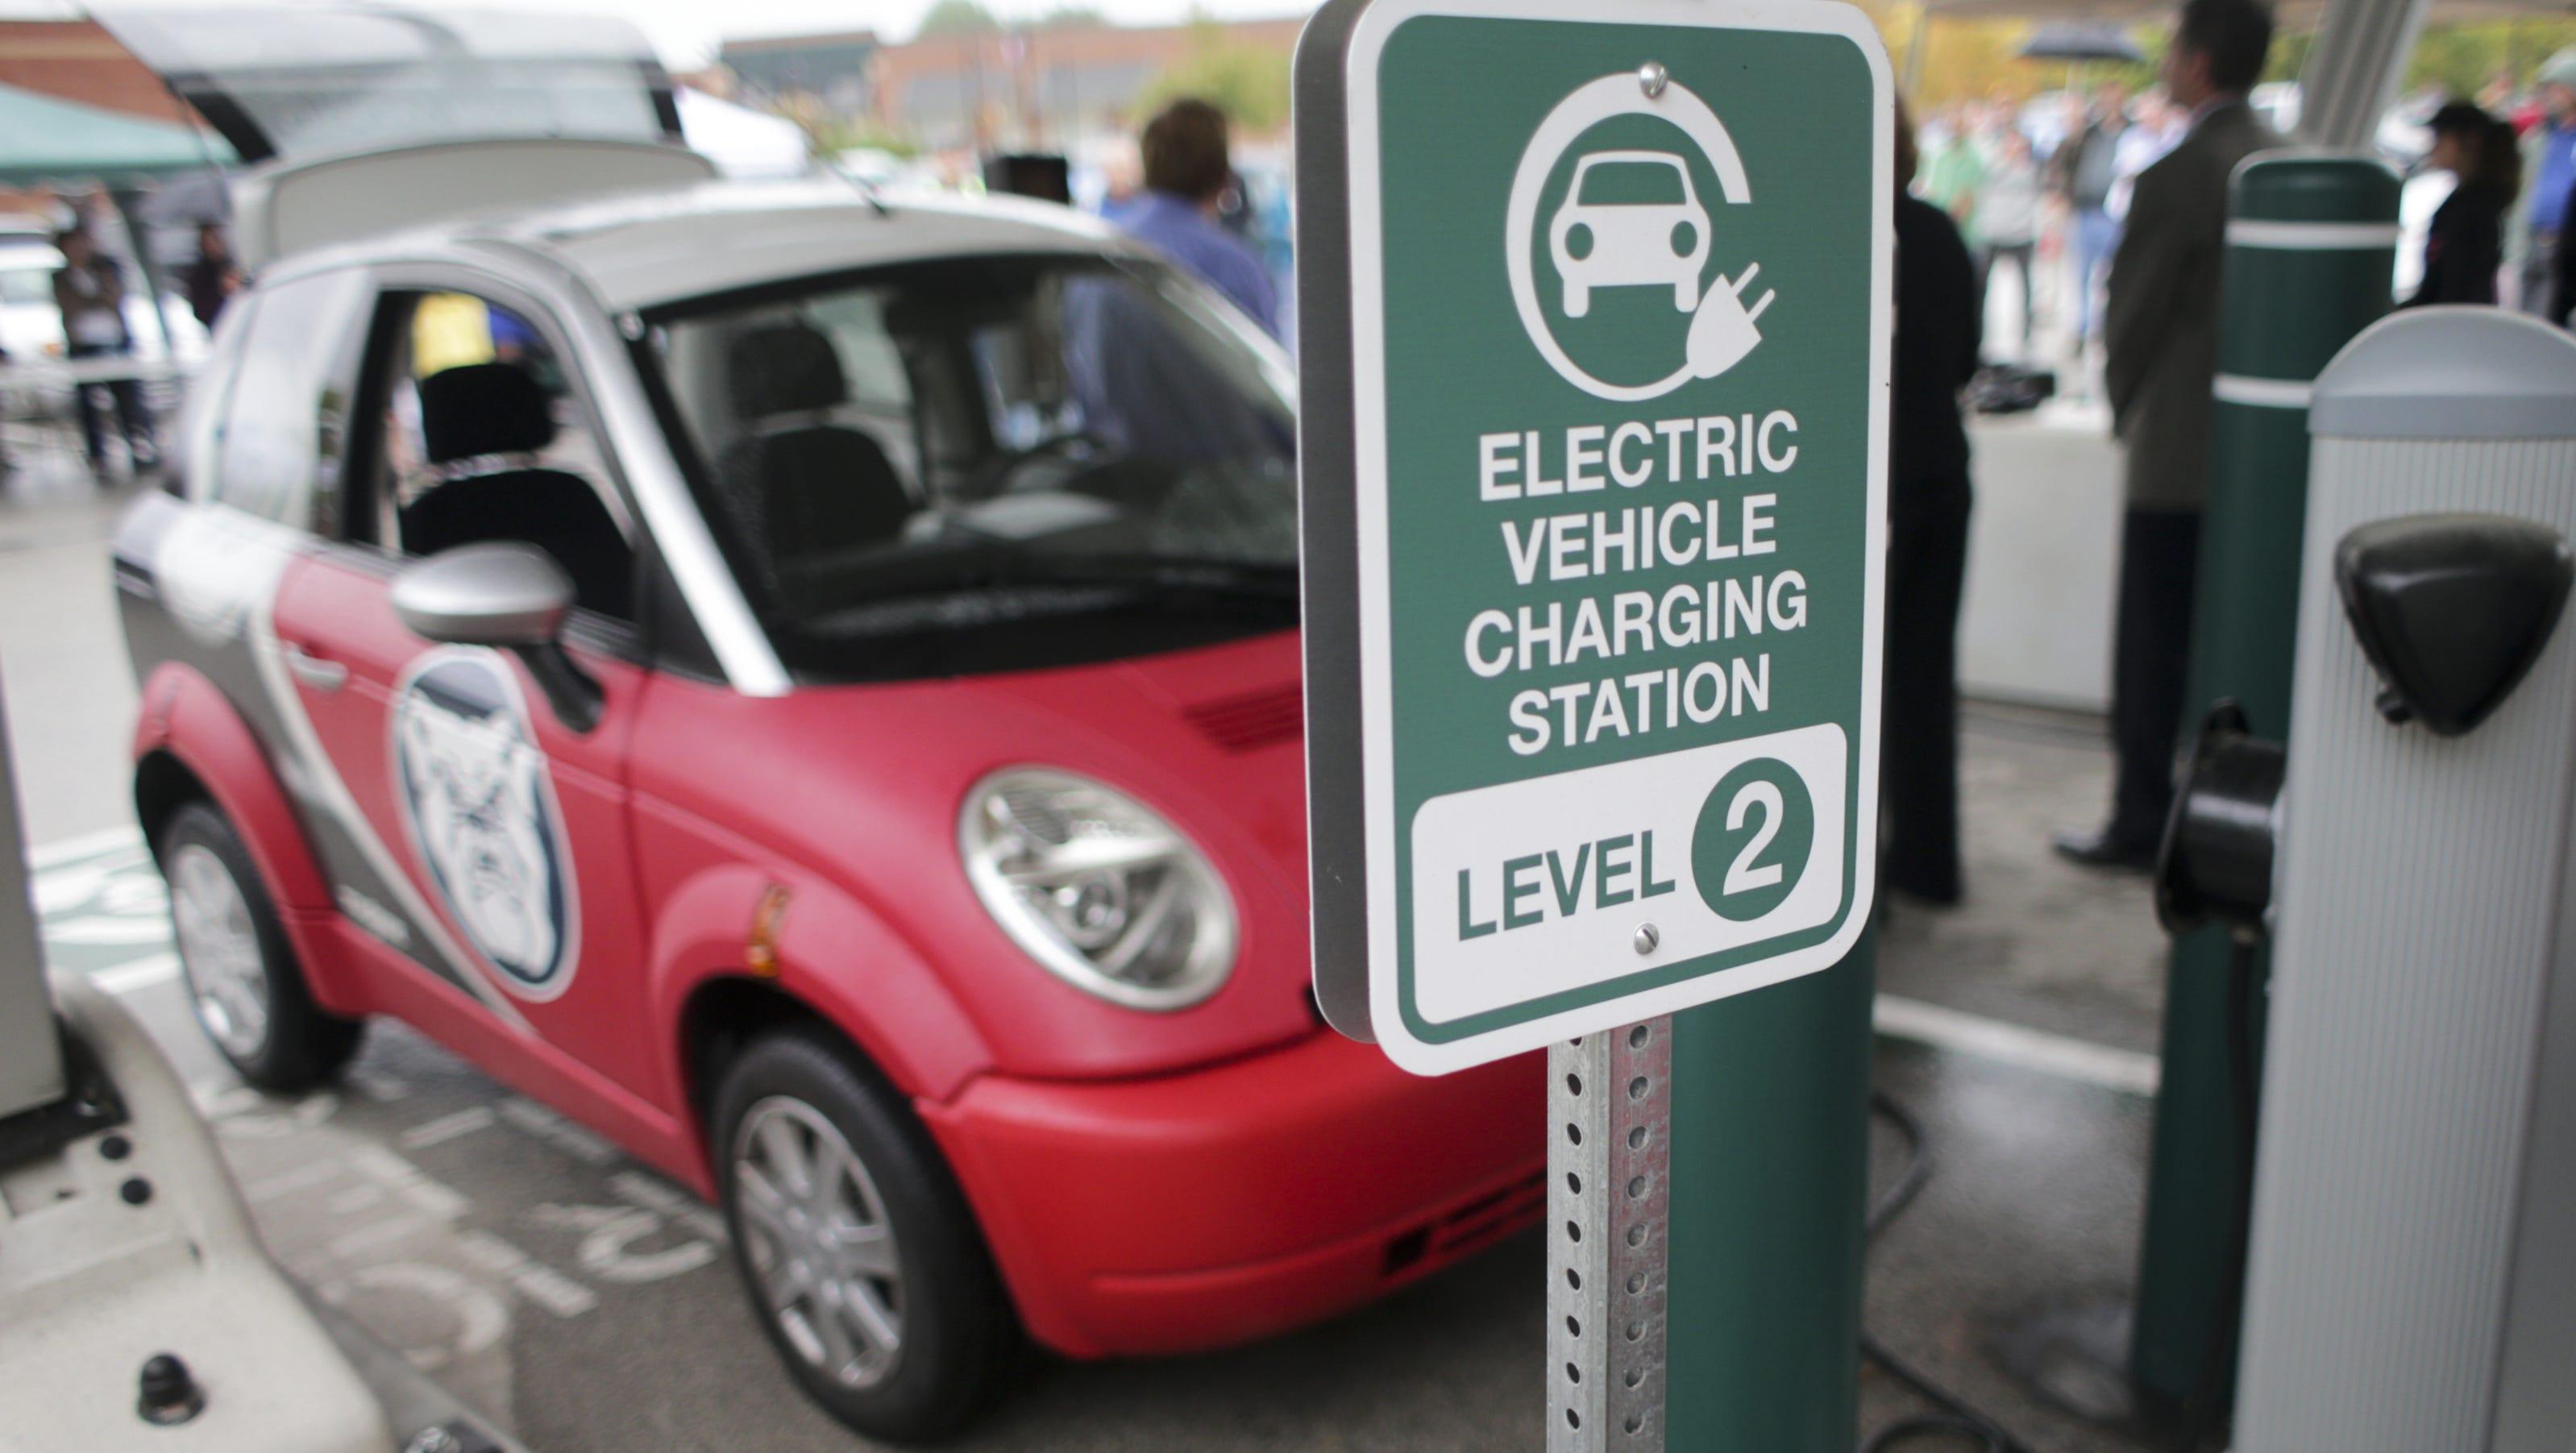 Ipl Network Electric Car